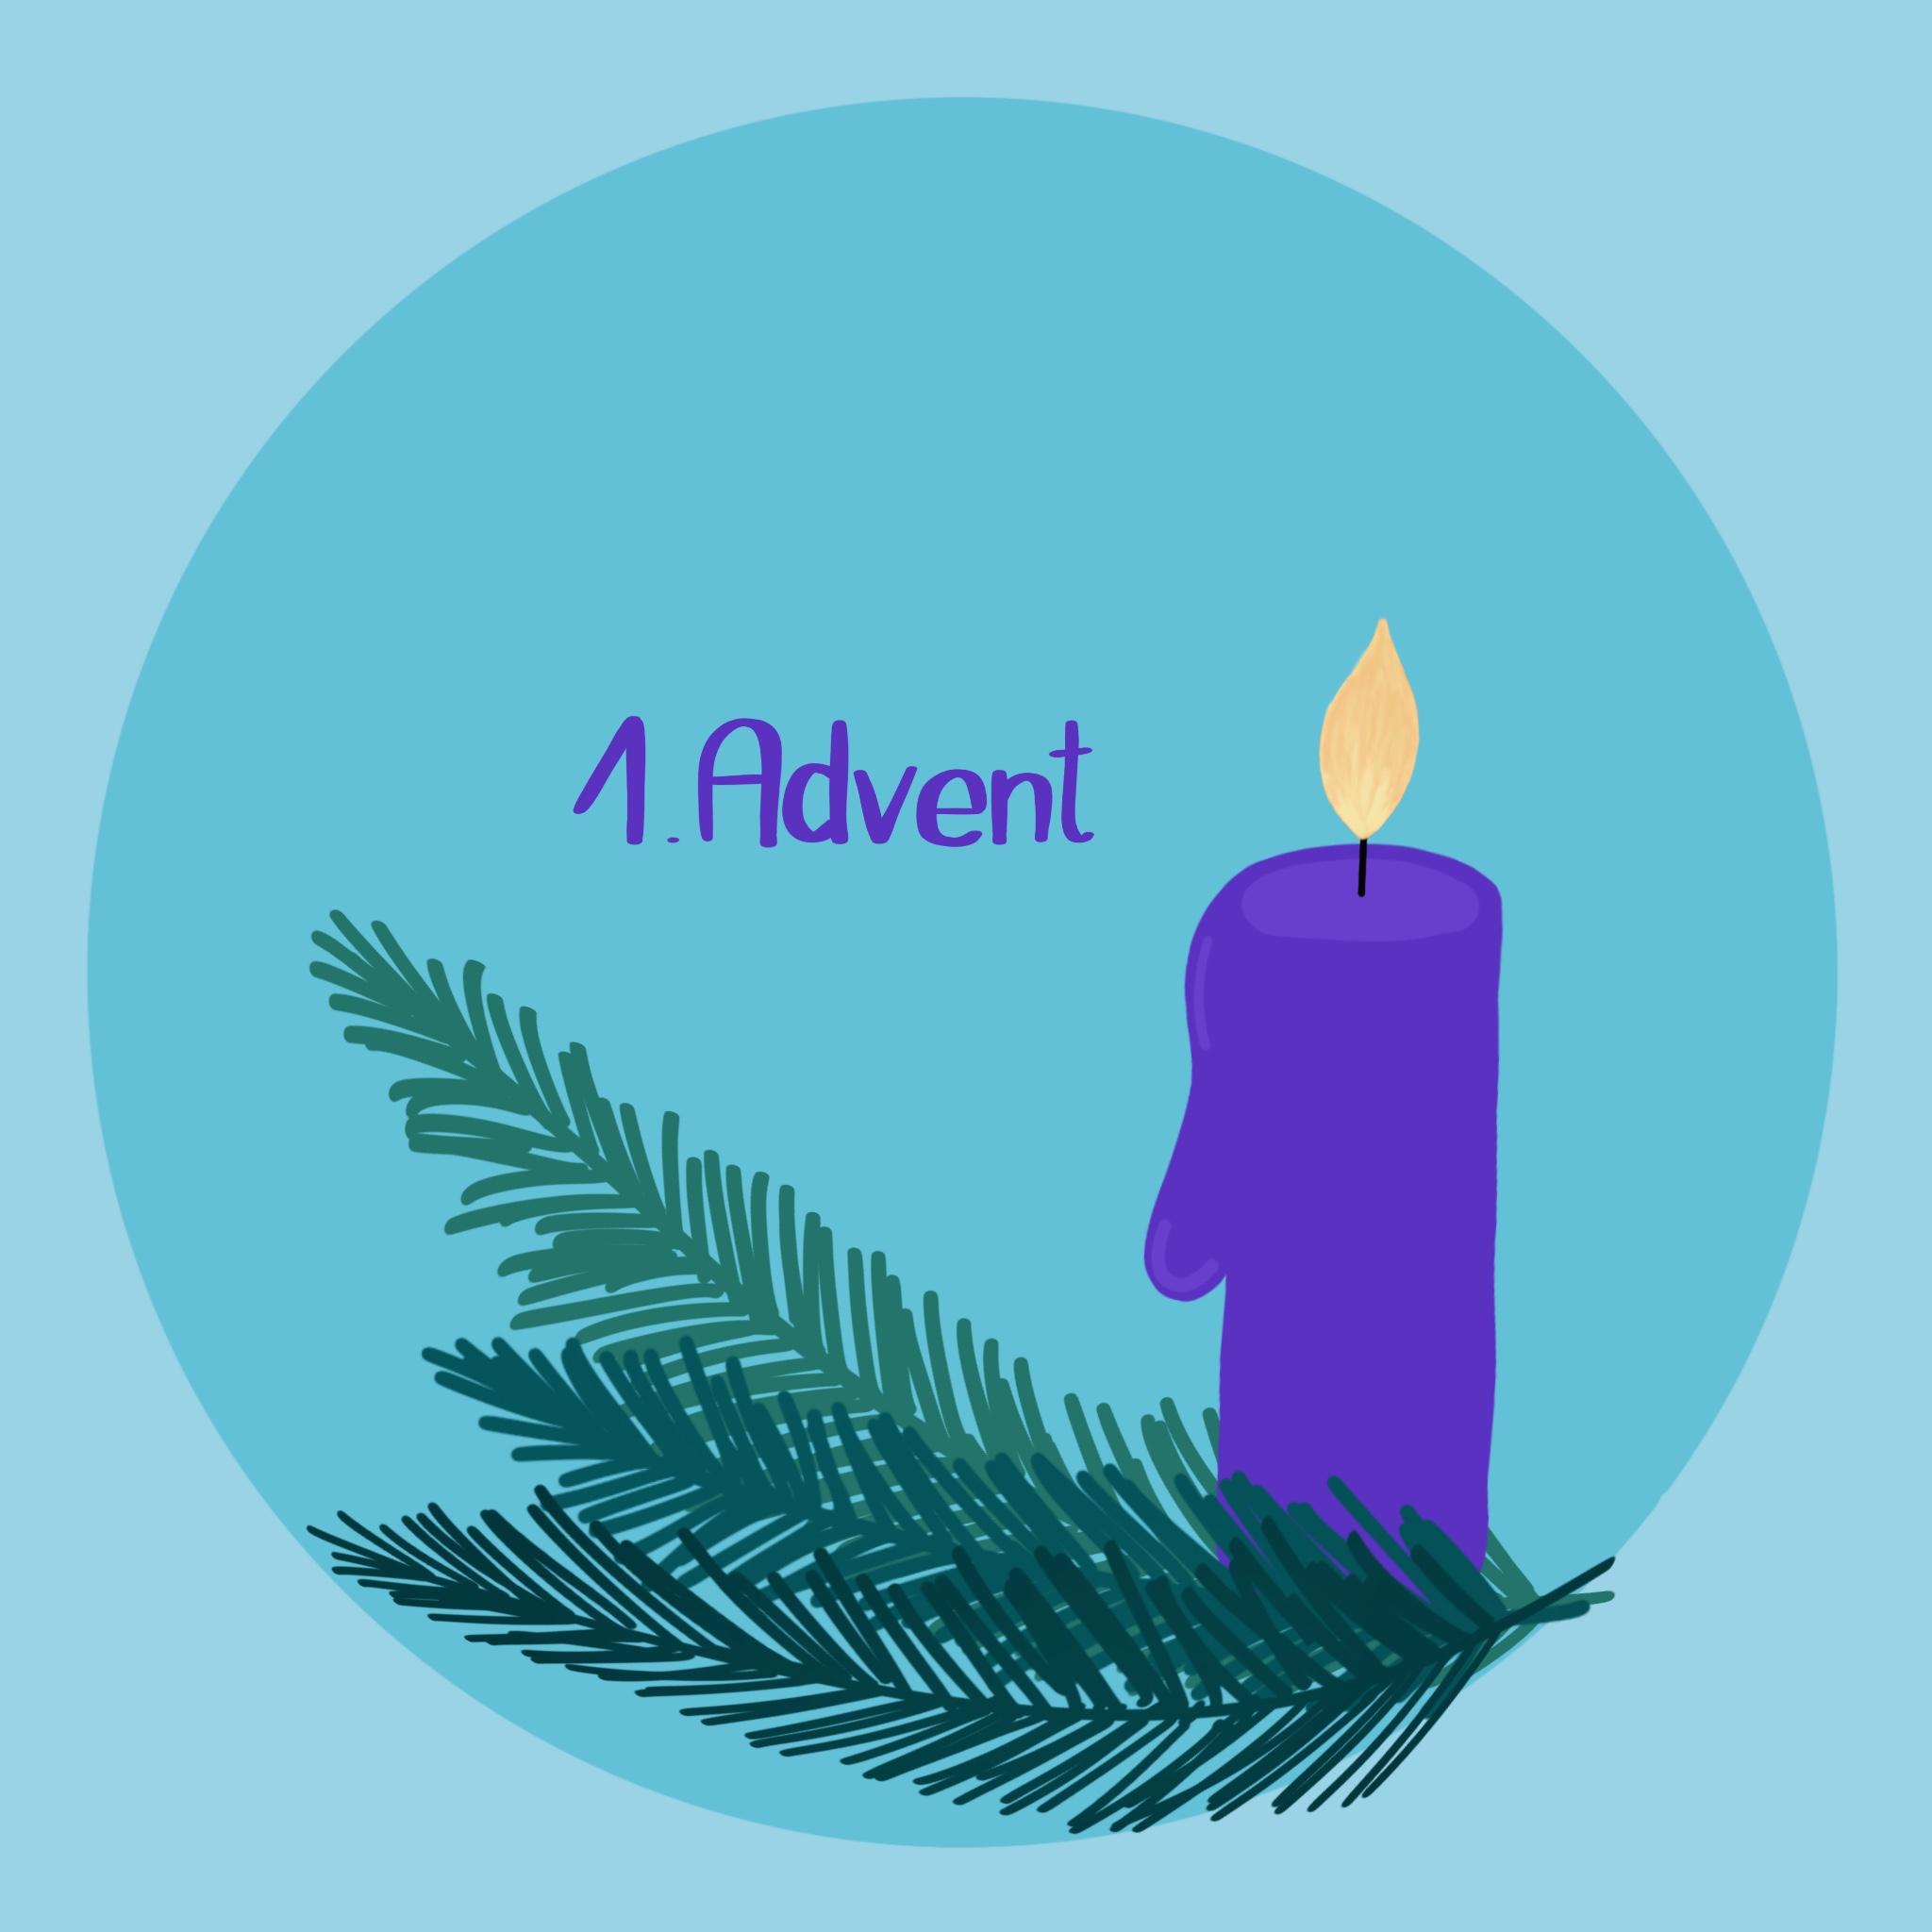 Adventskalender 29.11.2020